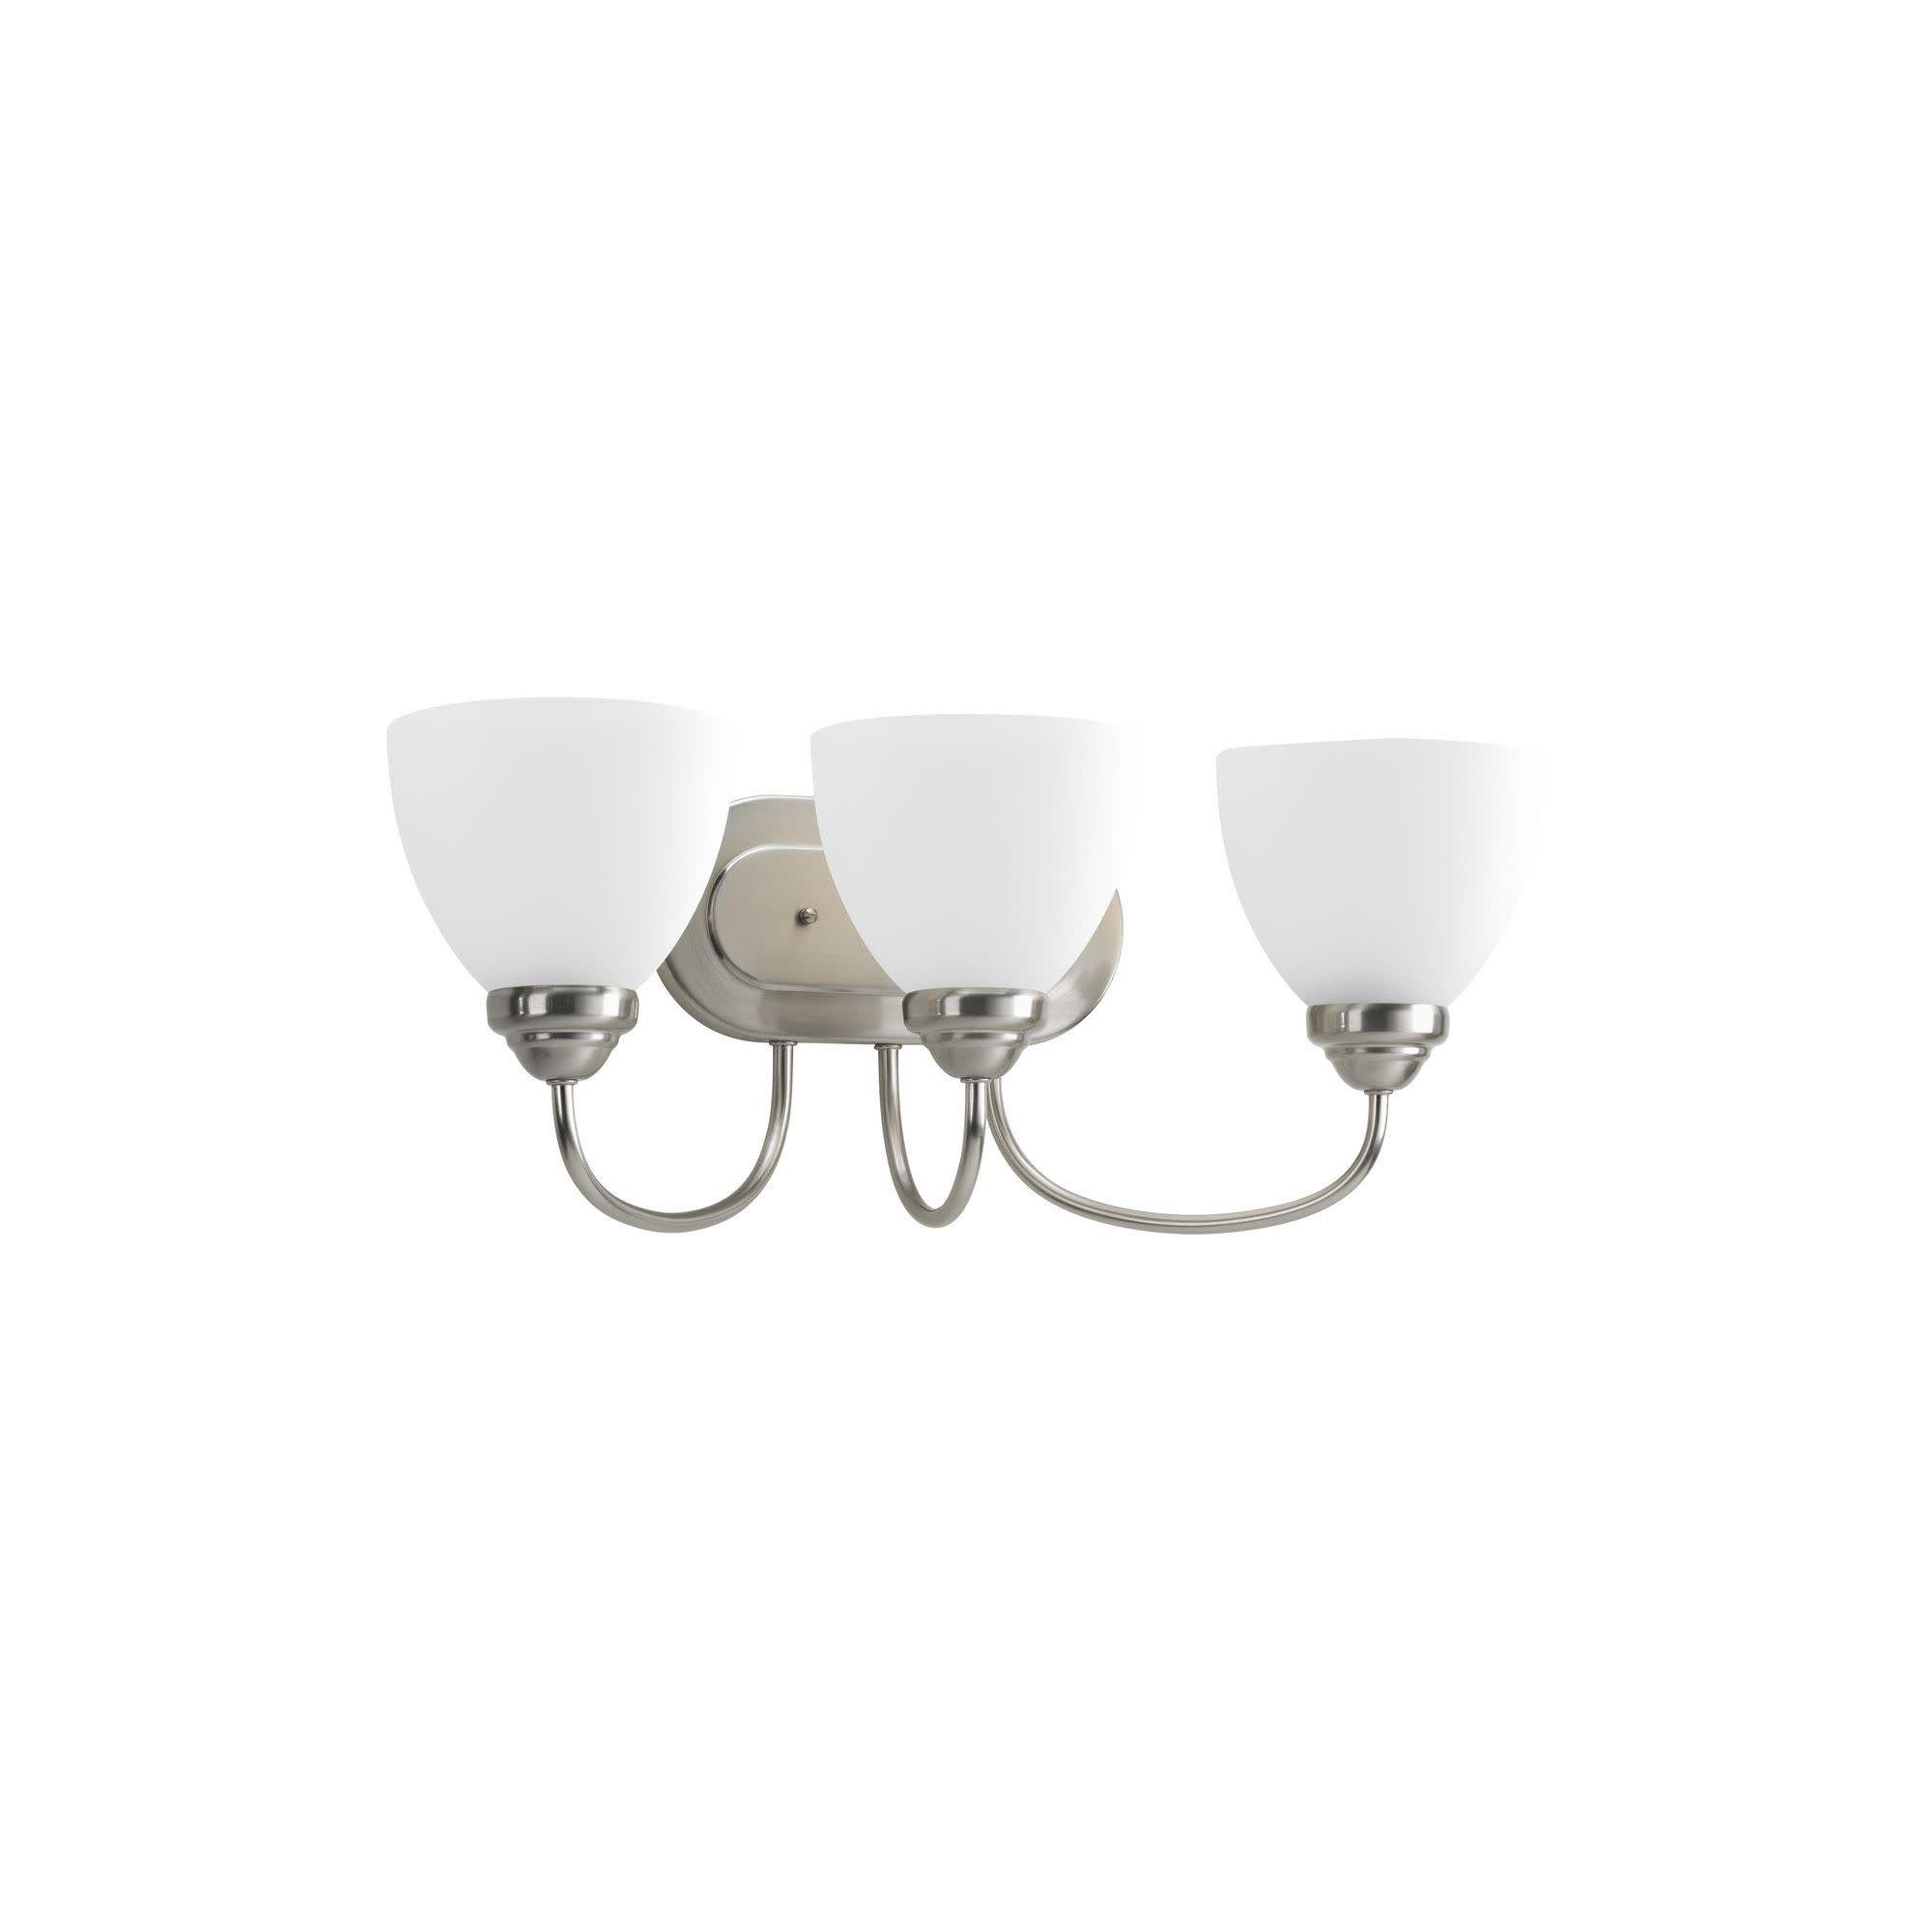 Photo of Progress Lighting P2919 Heart Three-Light Traditional Bathroom Fixture – Brushed Nickel